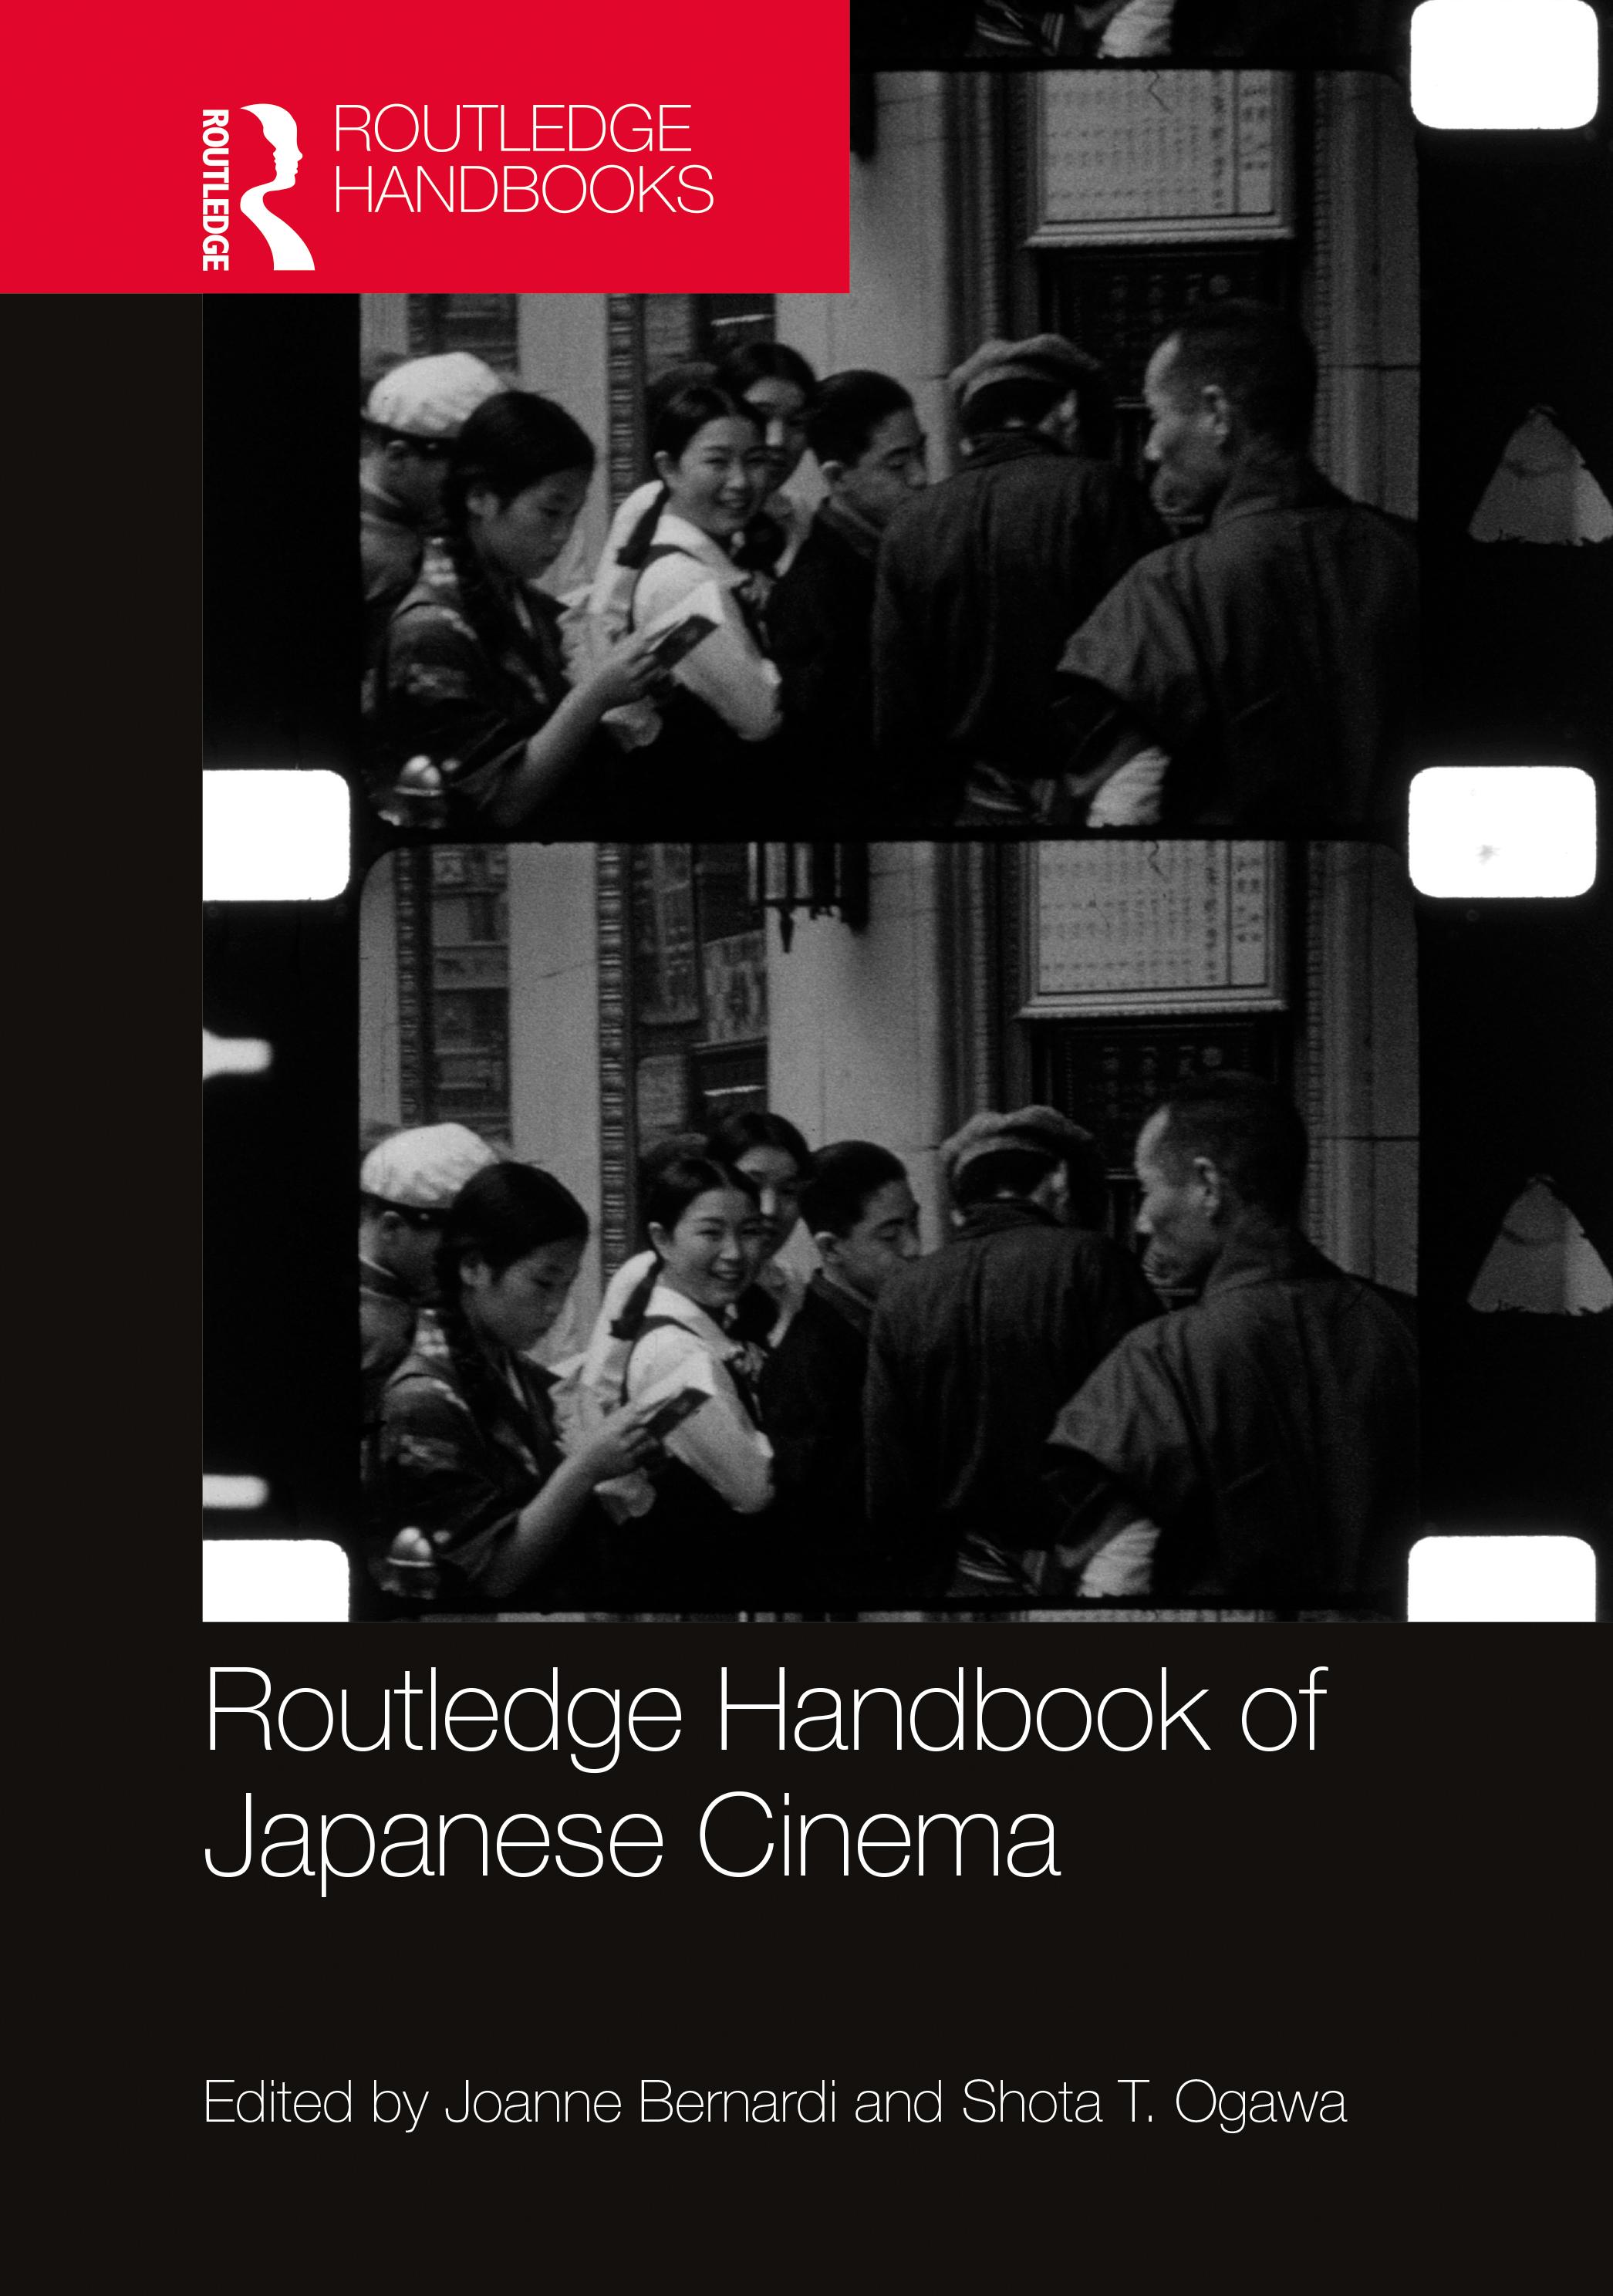 Routledge Handbook of Japanese Cinema book cover